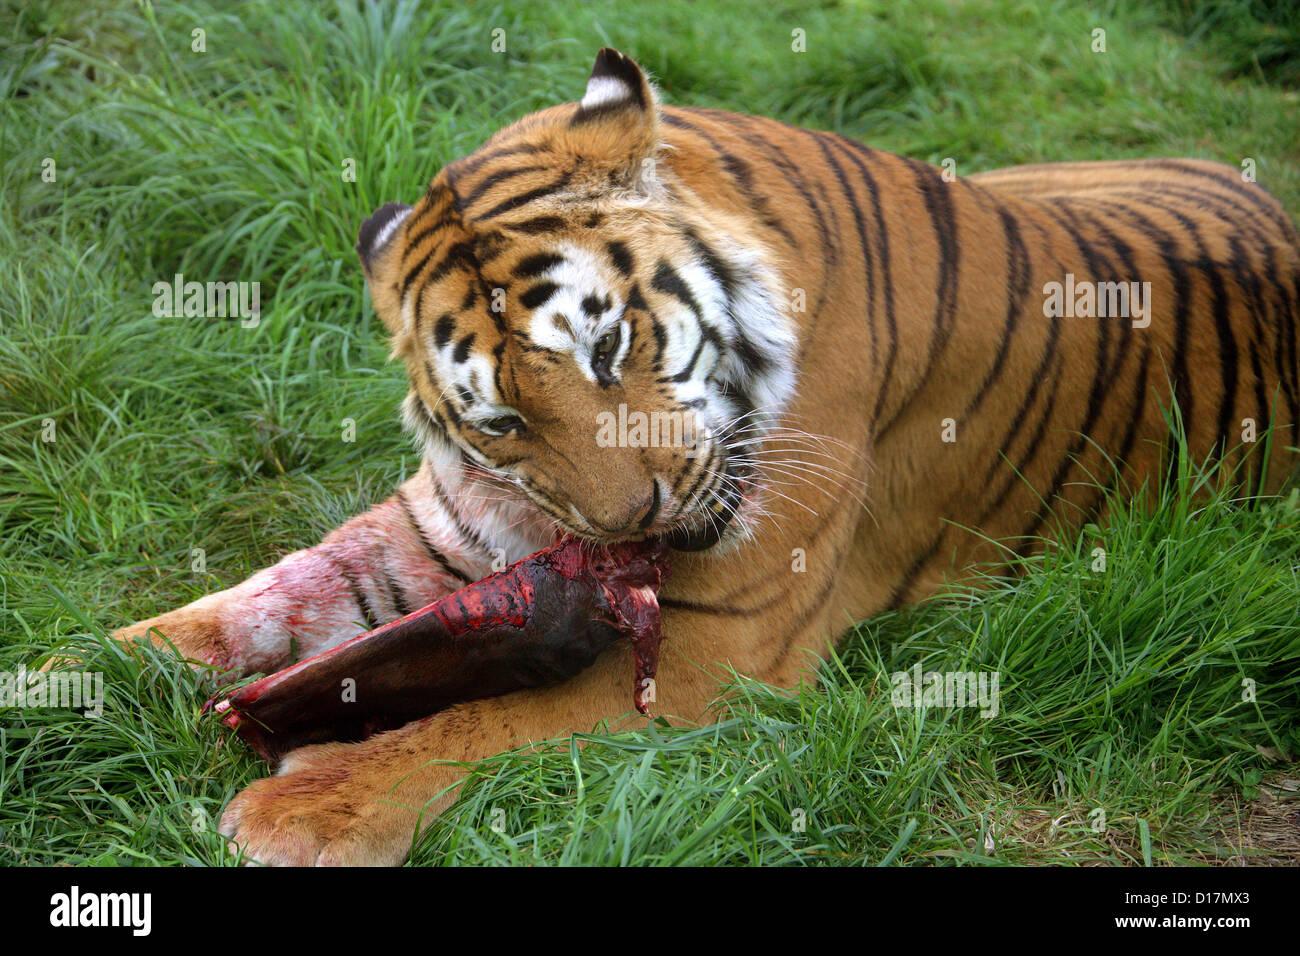 Siberian Tiger Feeding, Panthera tigris altaica, Felidae - Stock Image